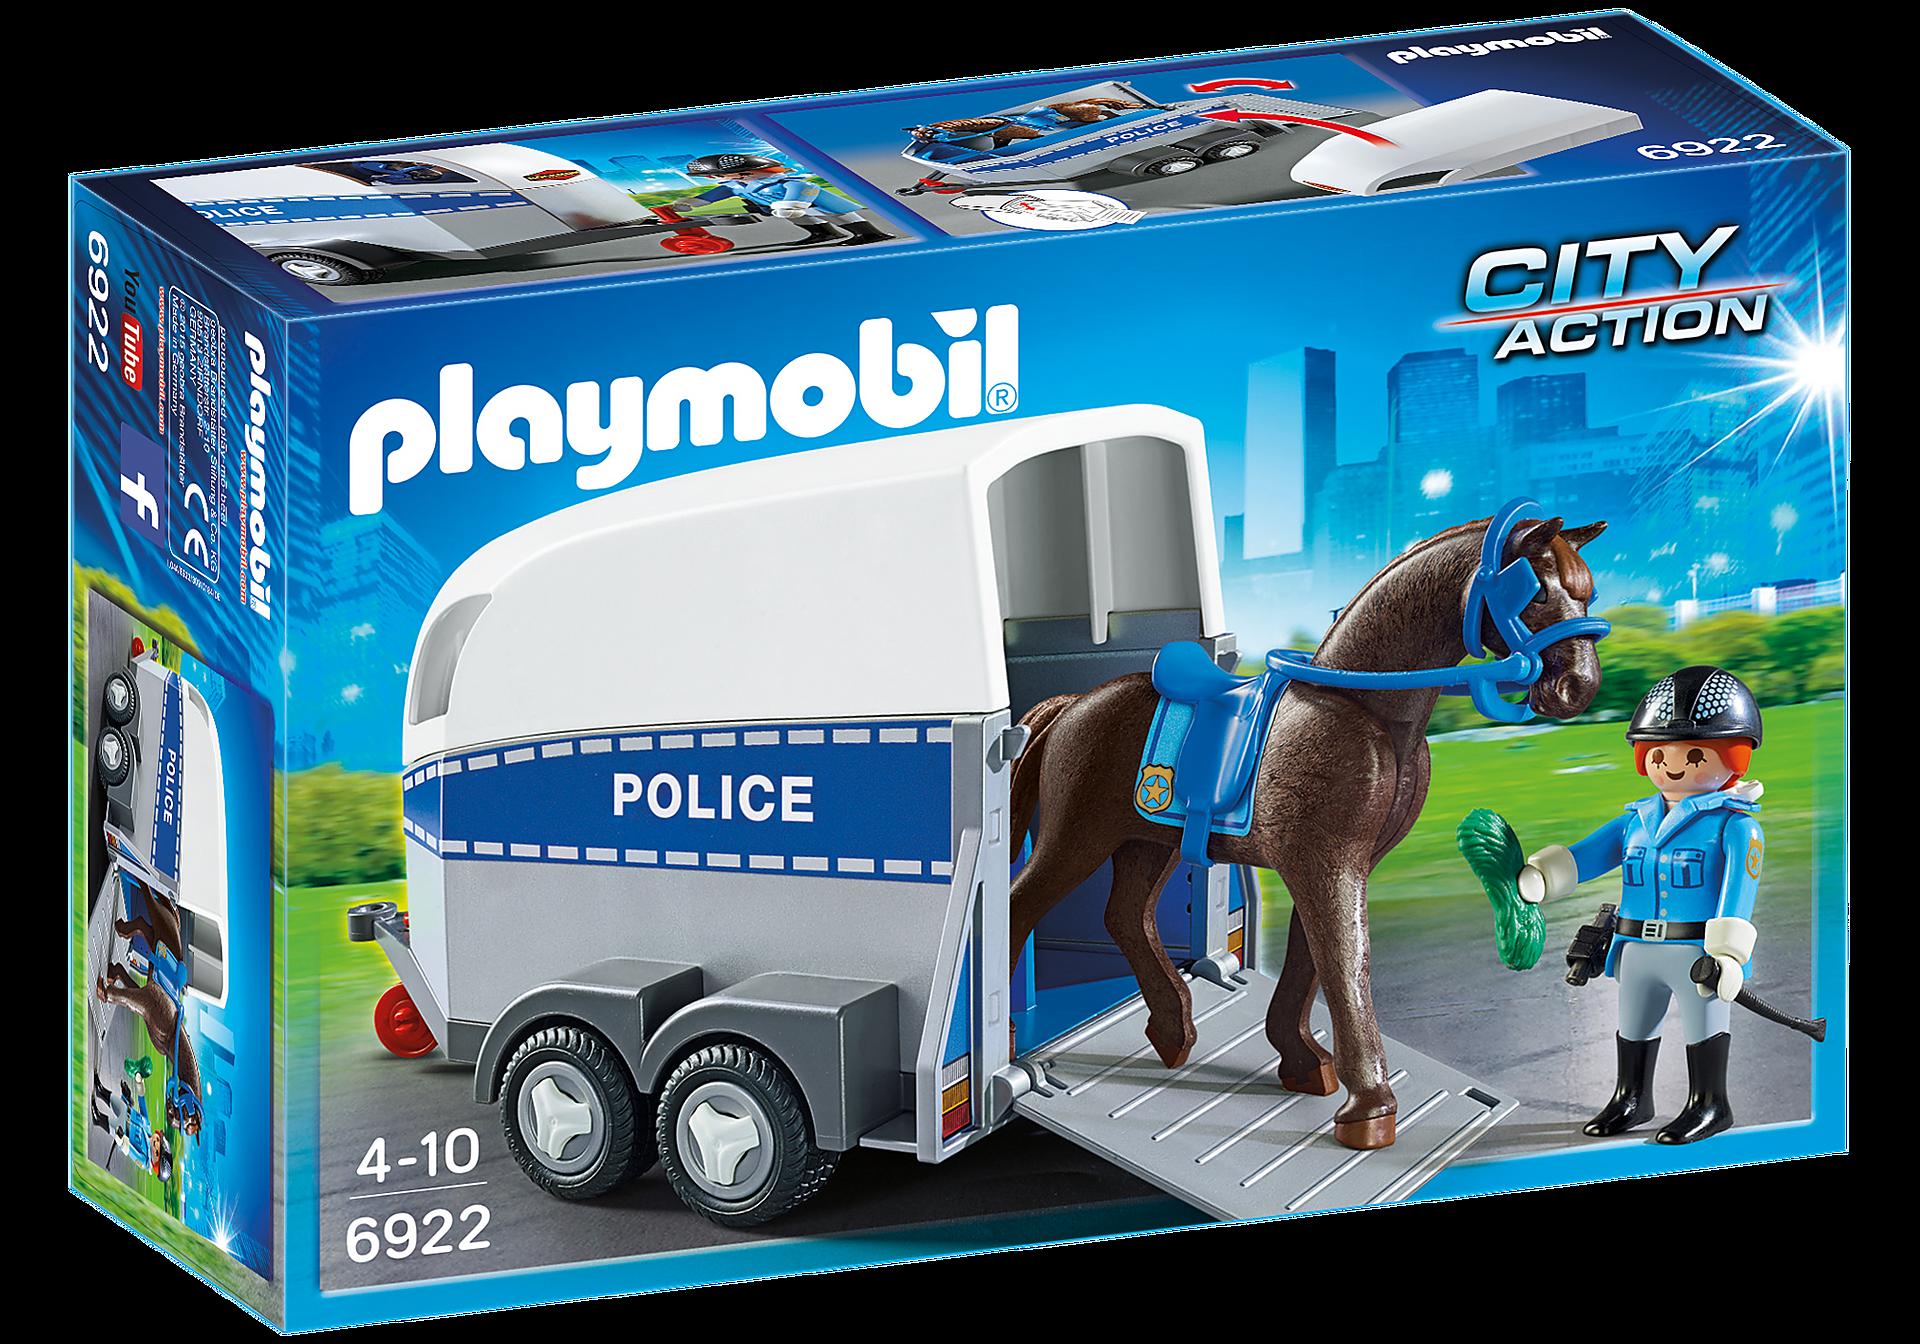 http://media.playmobil.com/i/playmobil/6922_product_box_front/Policière avec cheval et remorque